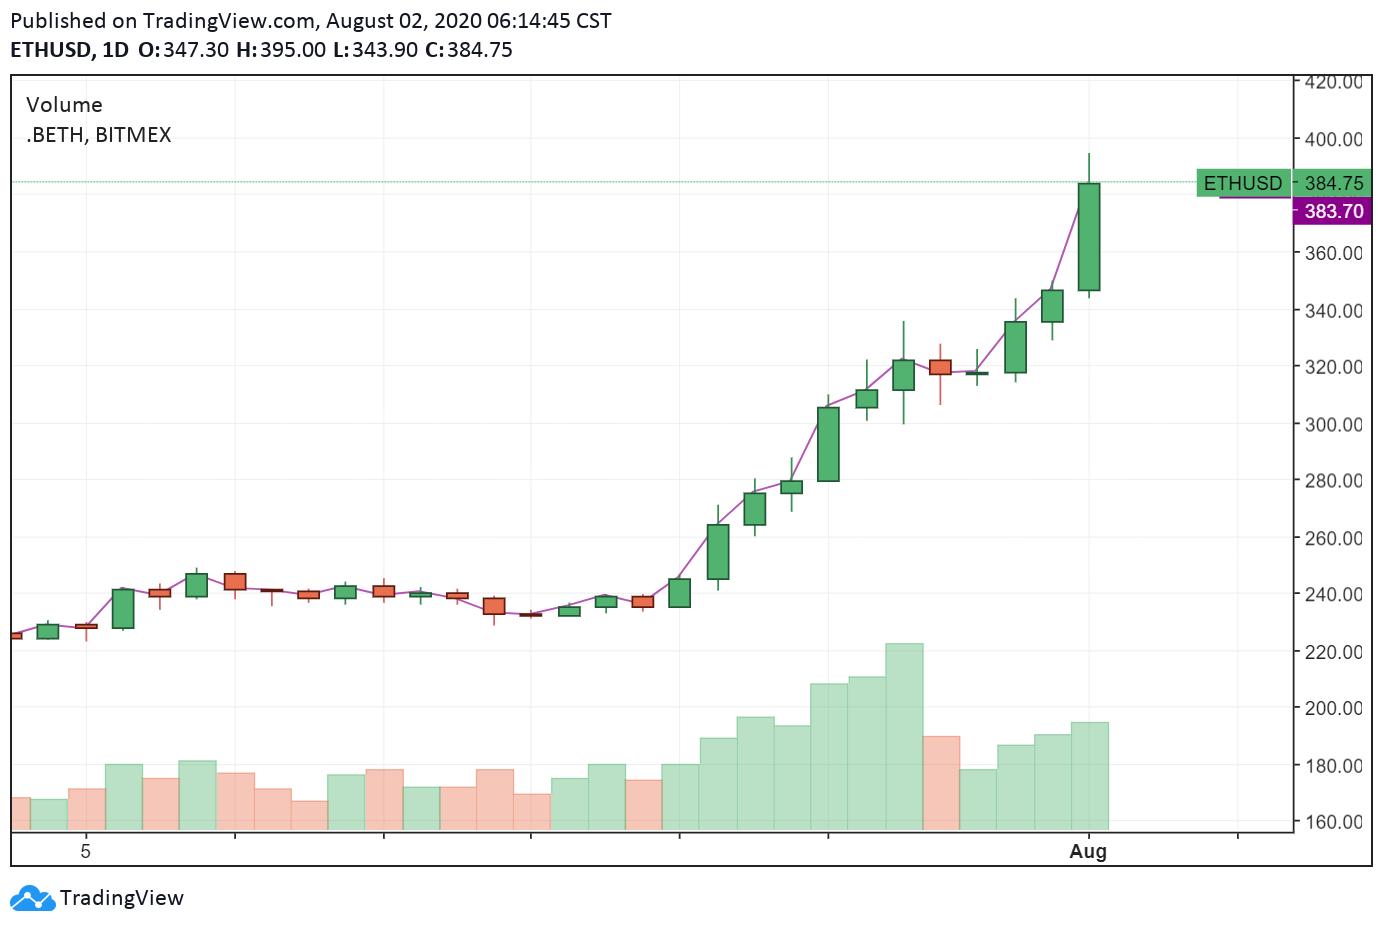 ETH-USD daily chart. Source: TradingView.com